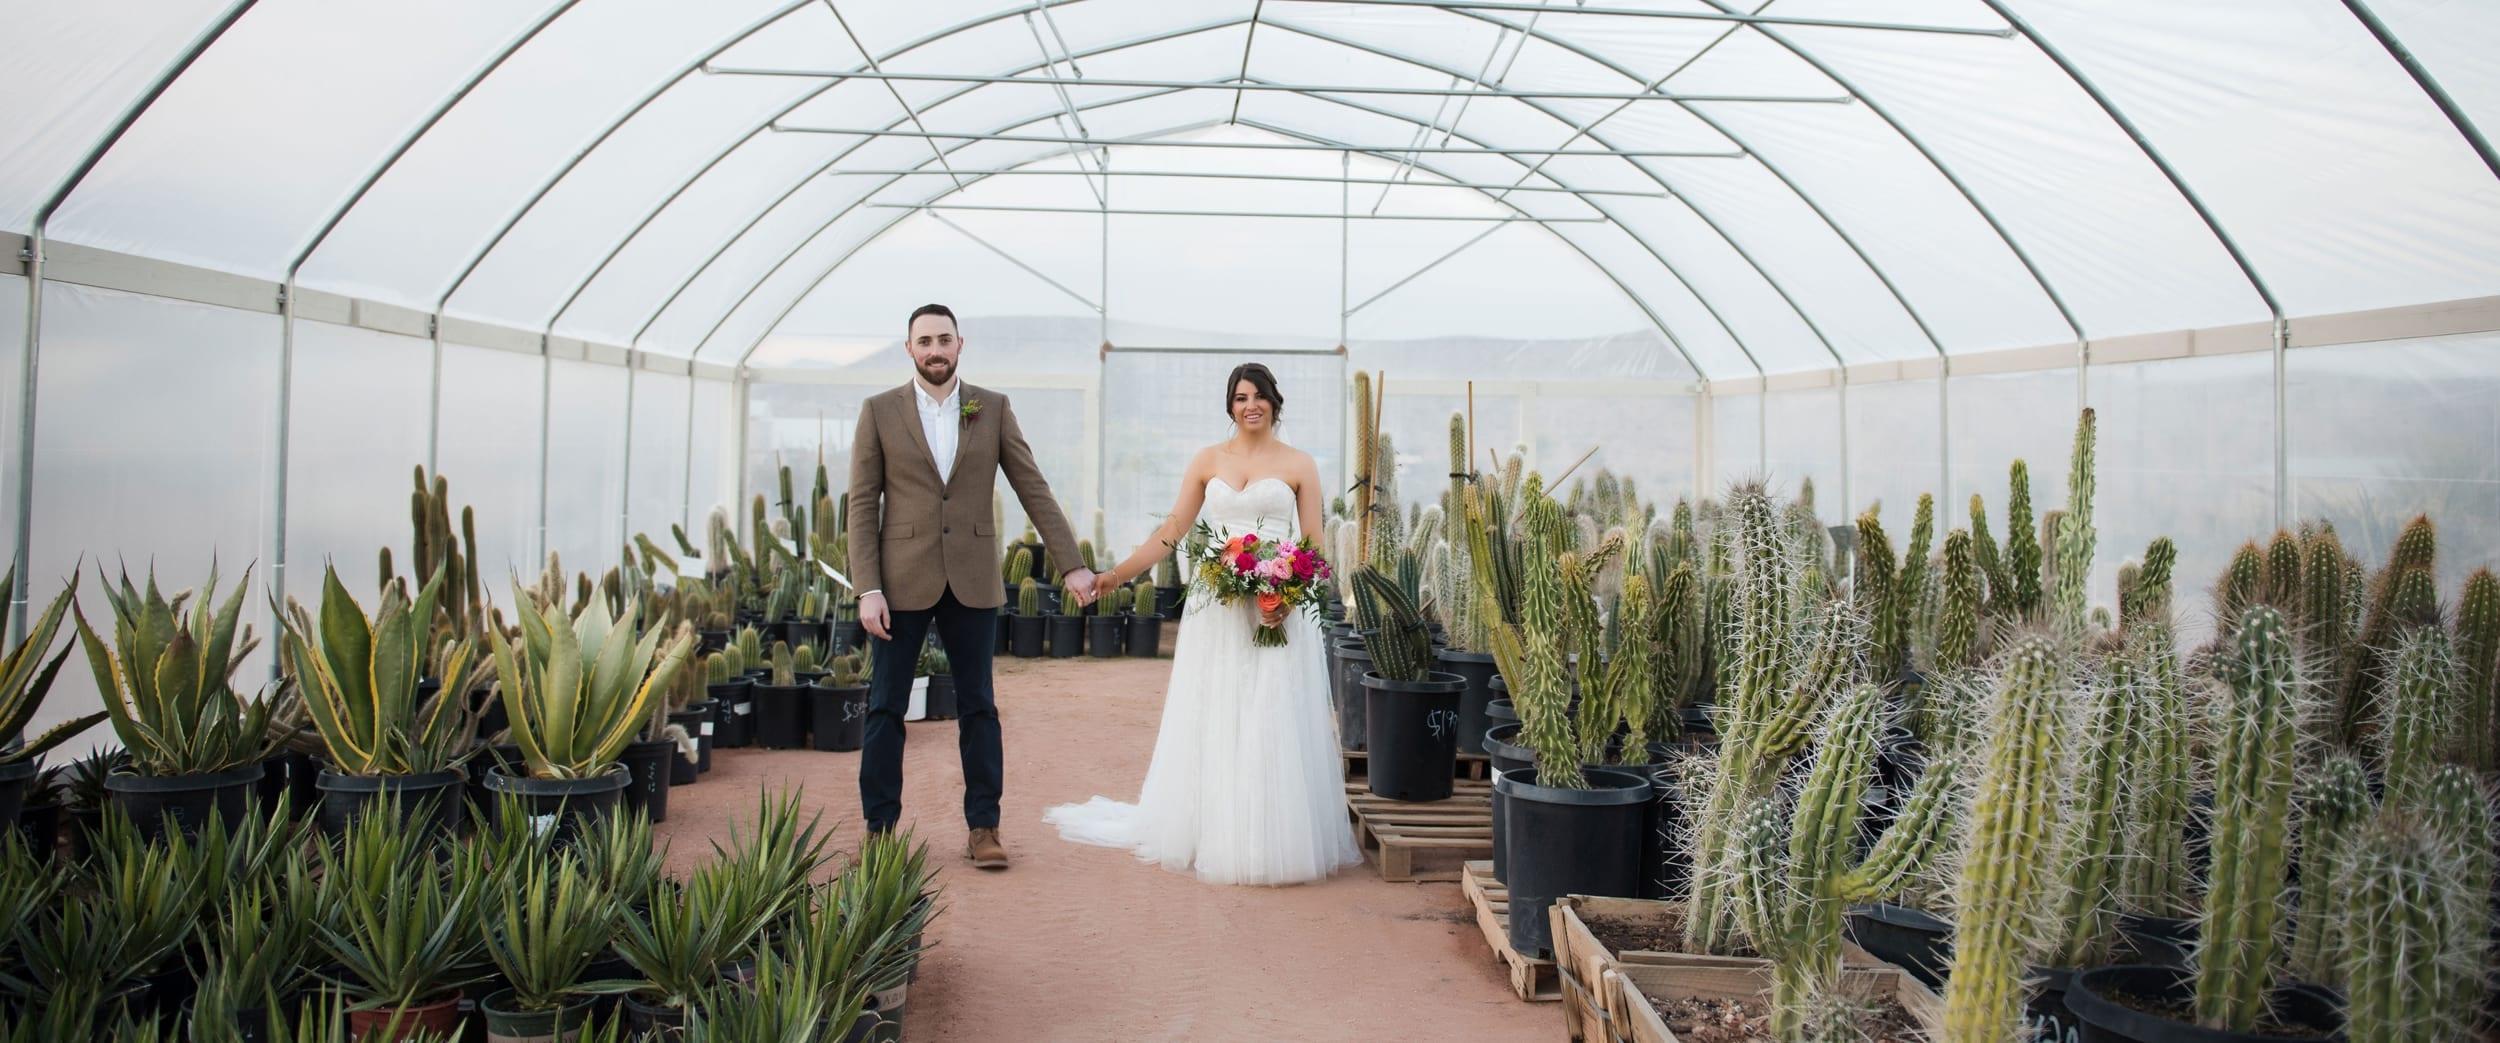 Bride and groom pose in a cactus garden.